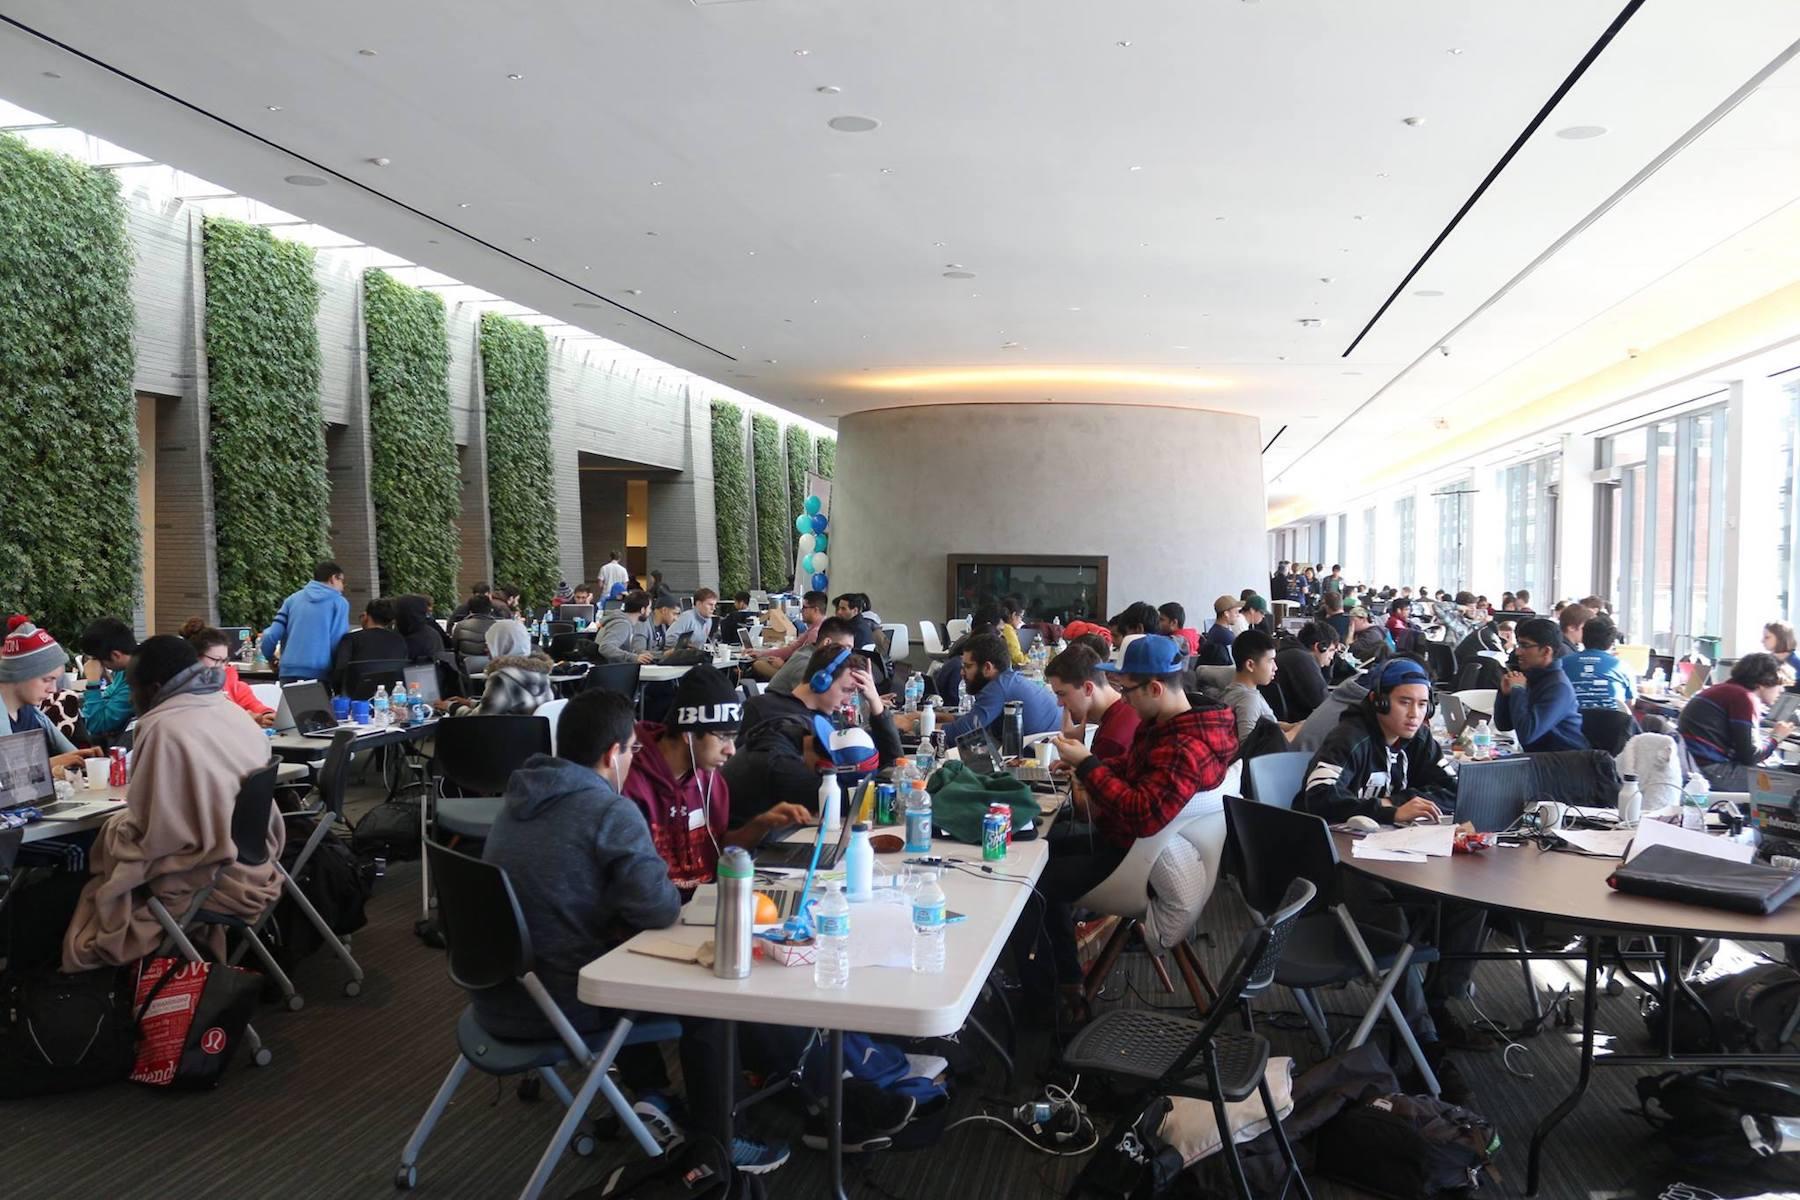 Hoya Hacks in HFSC